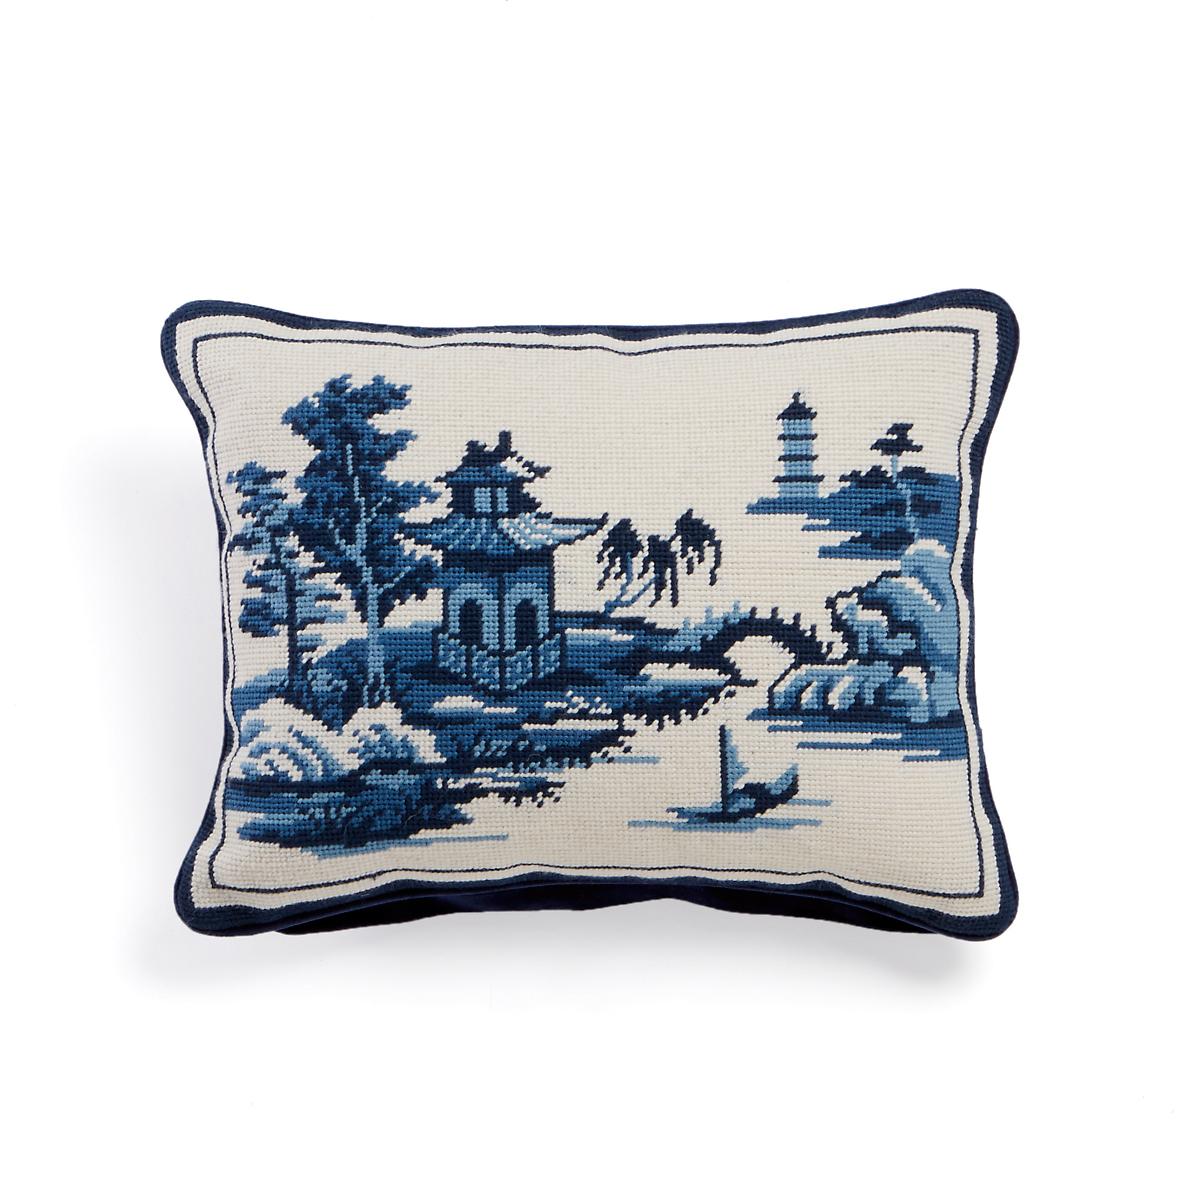 Canton Blue Pagoda Needlepoint Pillow